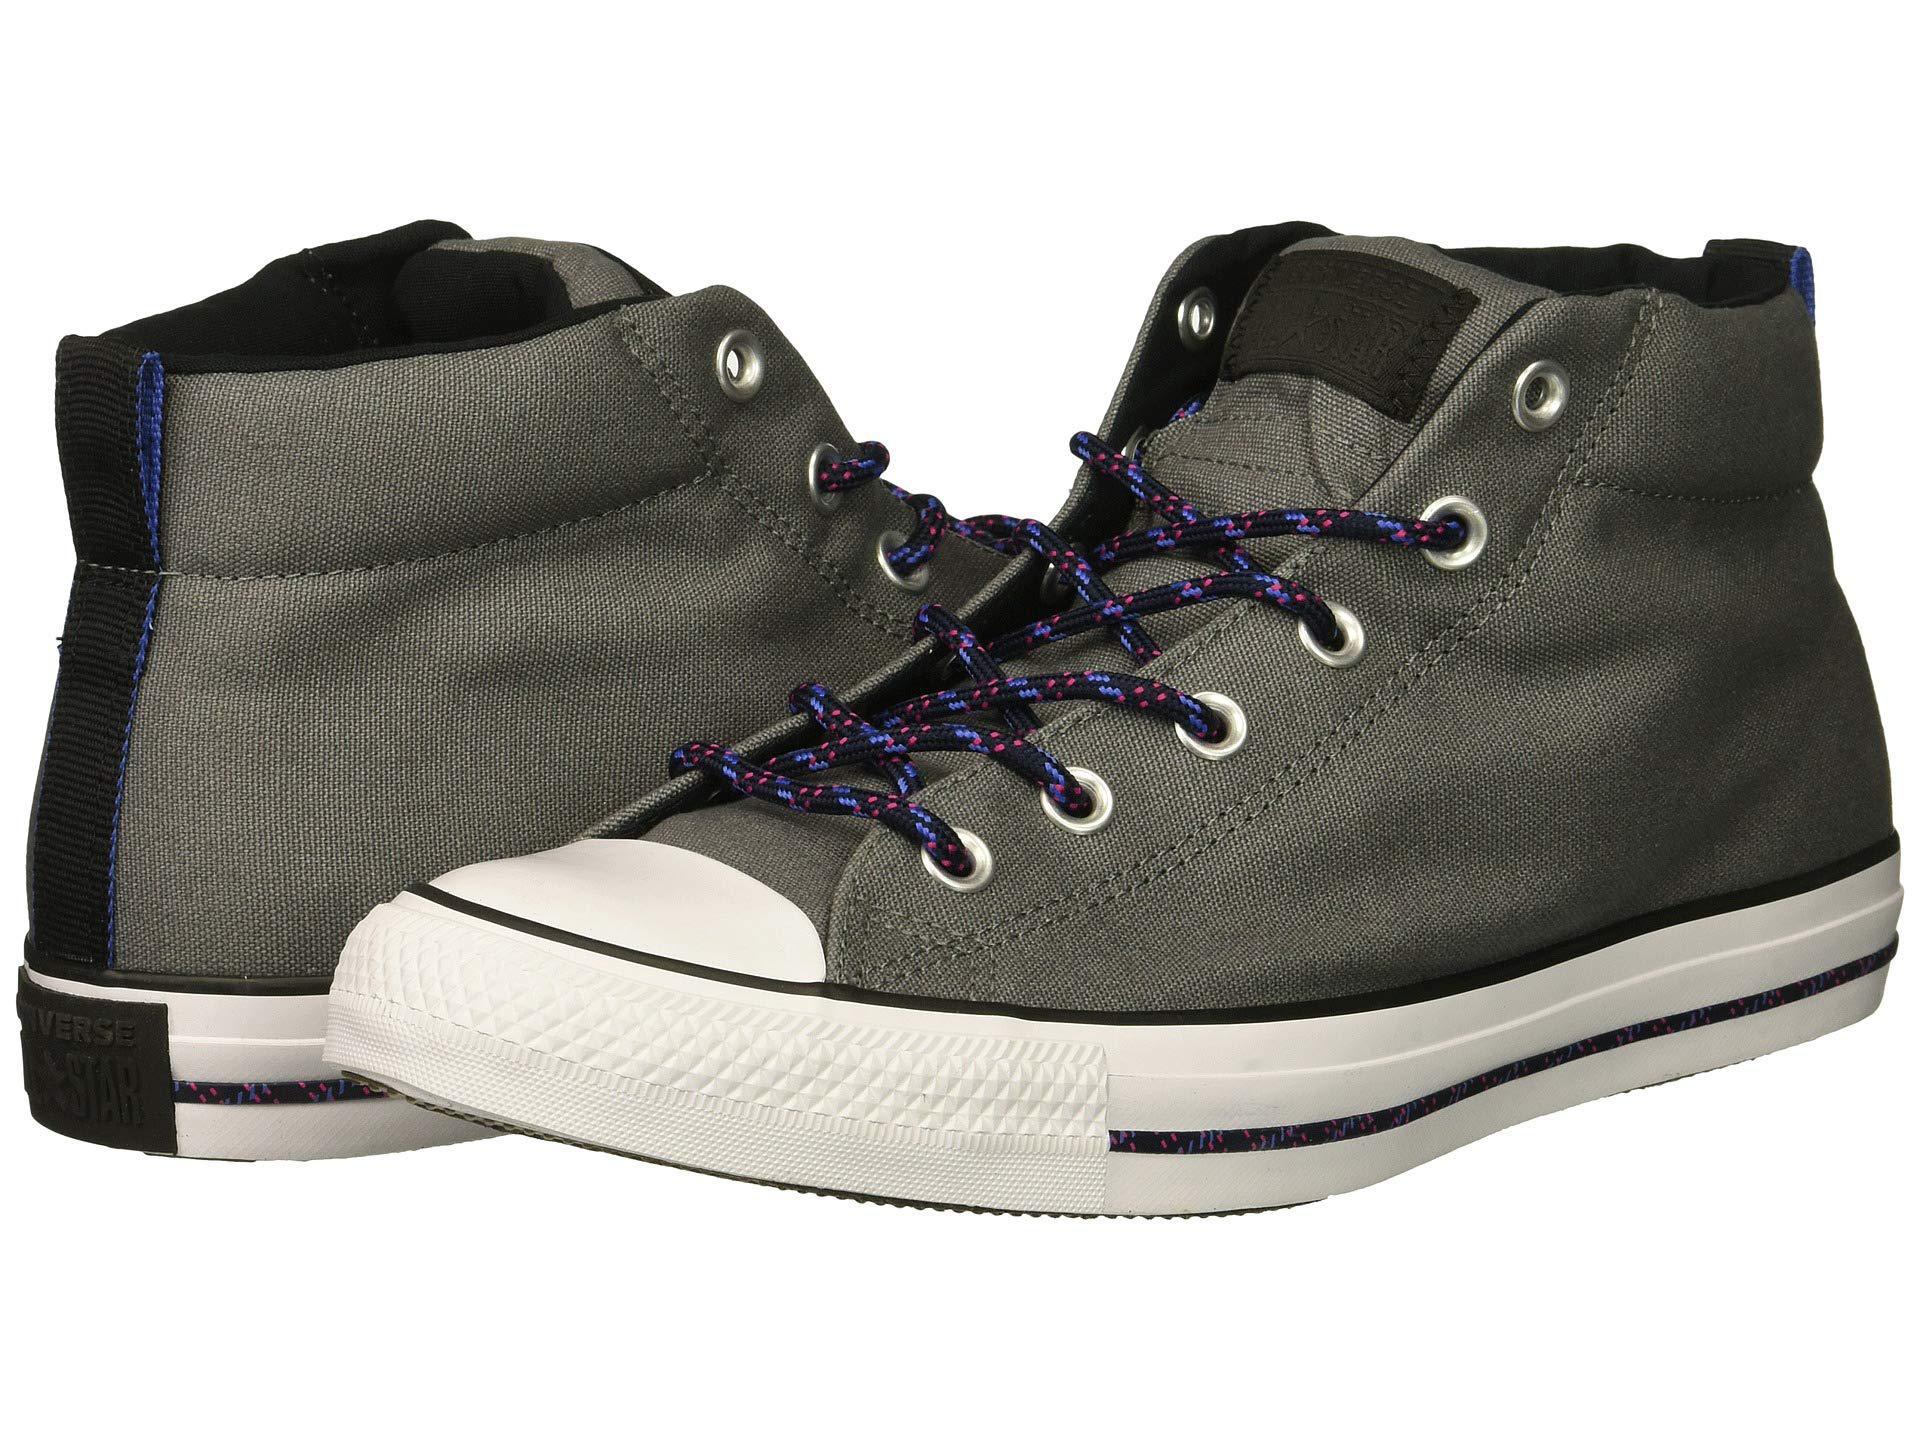 c8afd1b4897 Lyst - Converse Chuck Taylor(r) All Star(r) Street Mid (mason black ...